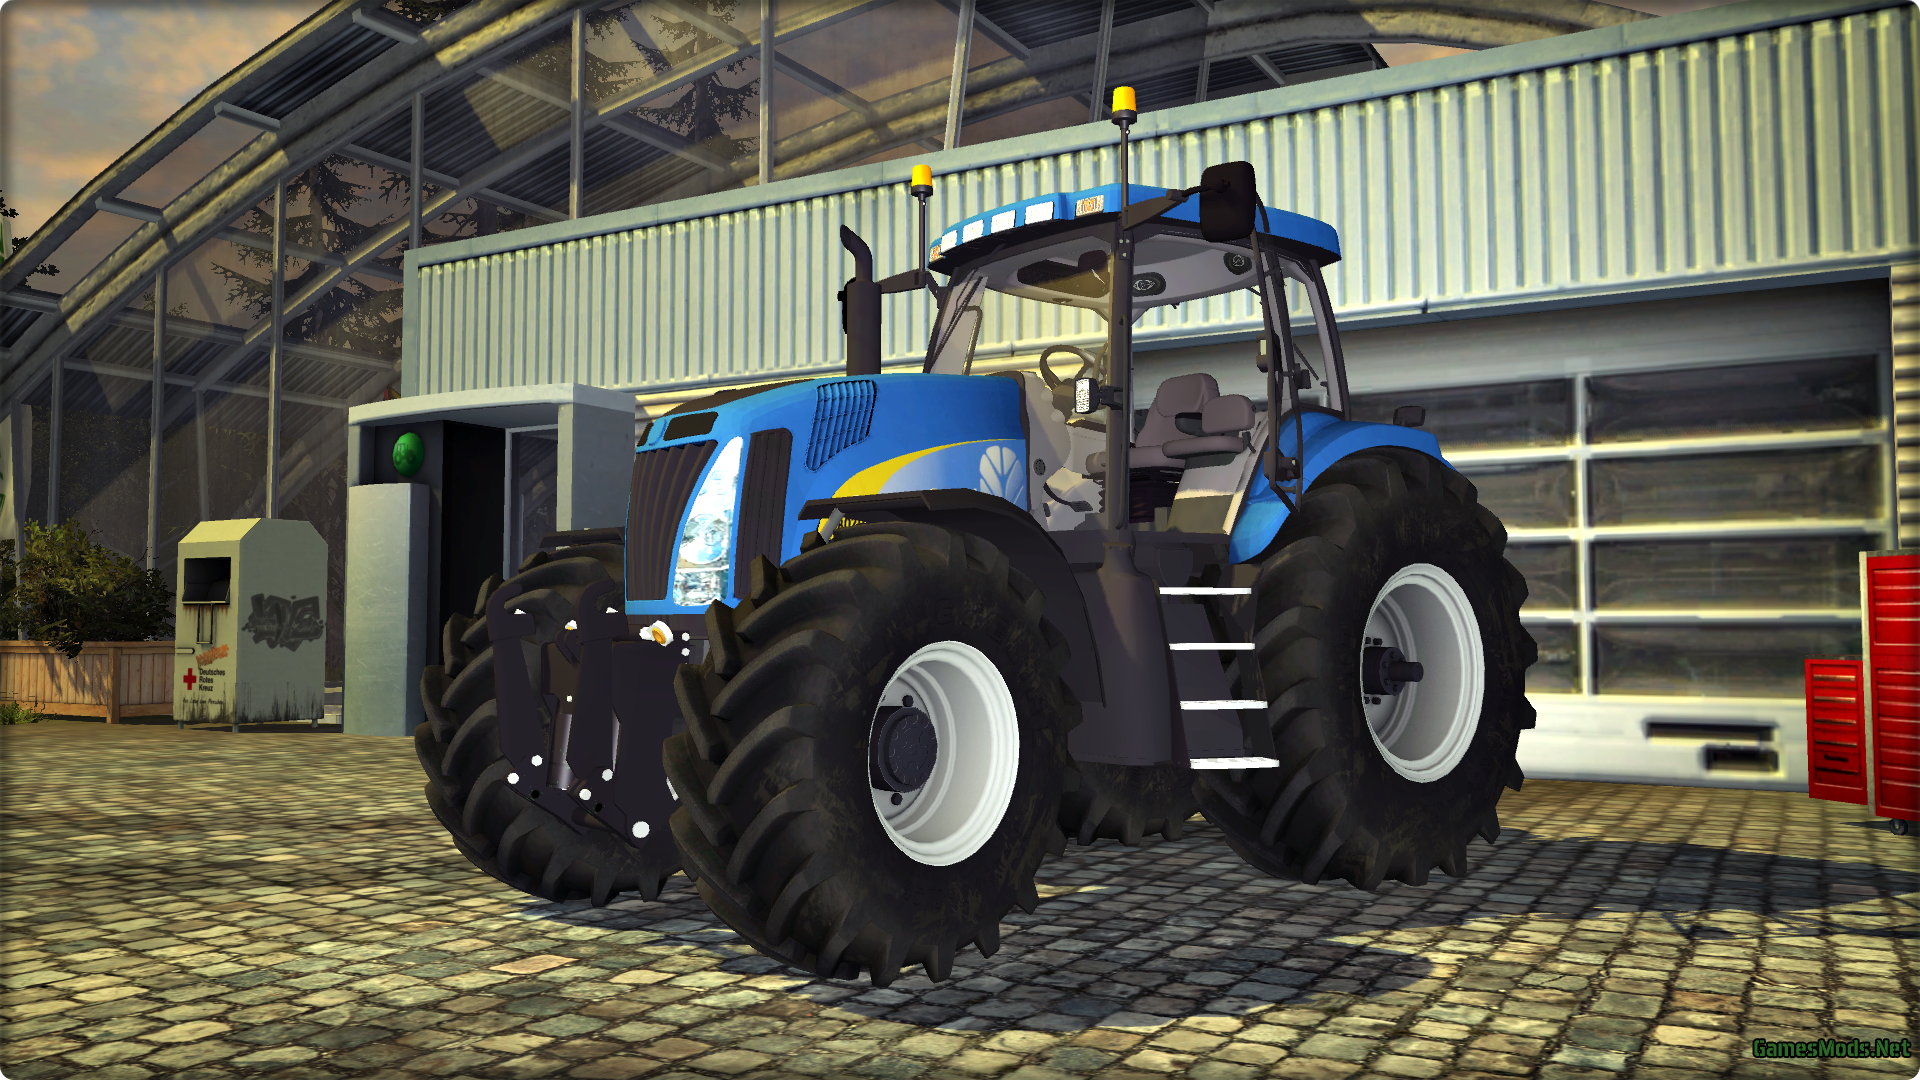 Farming simulator 2013 » Page 33